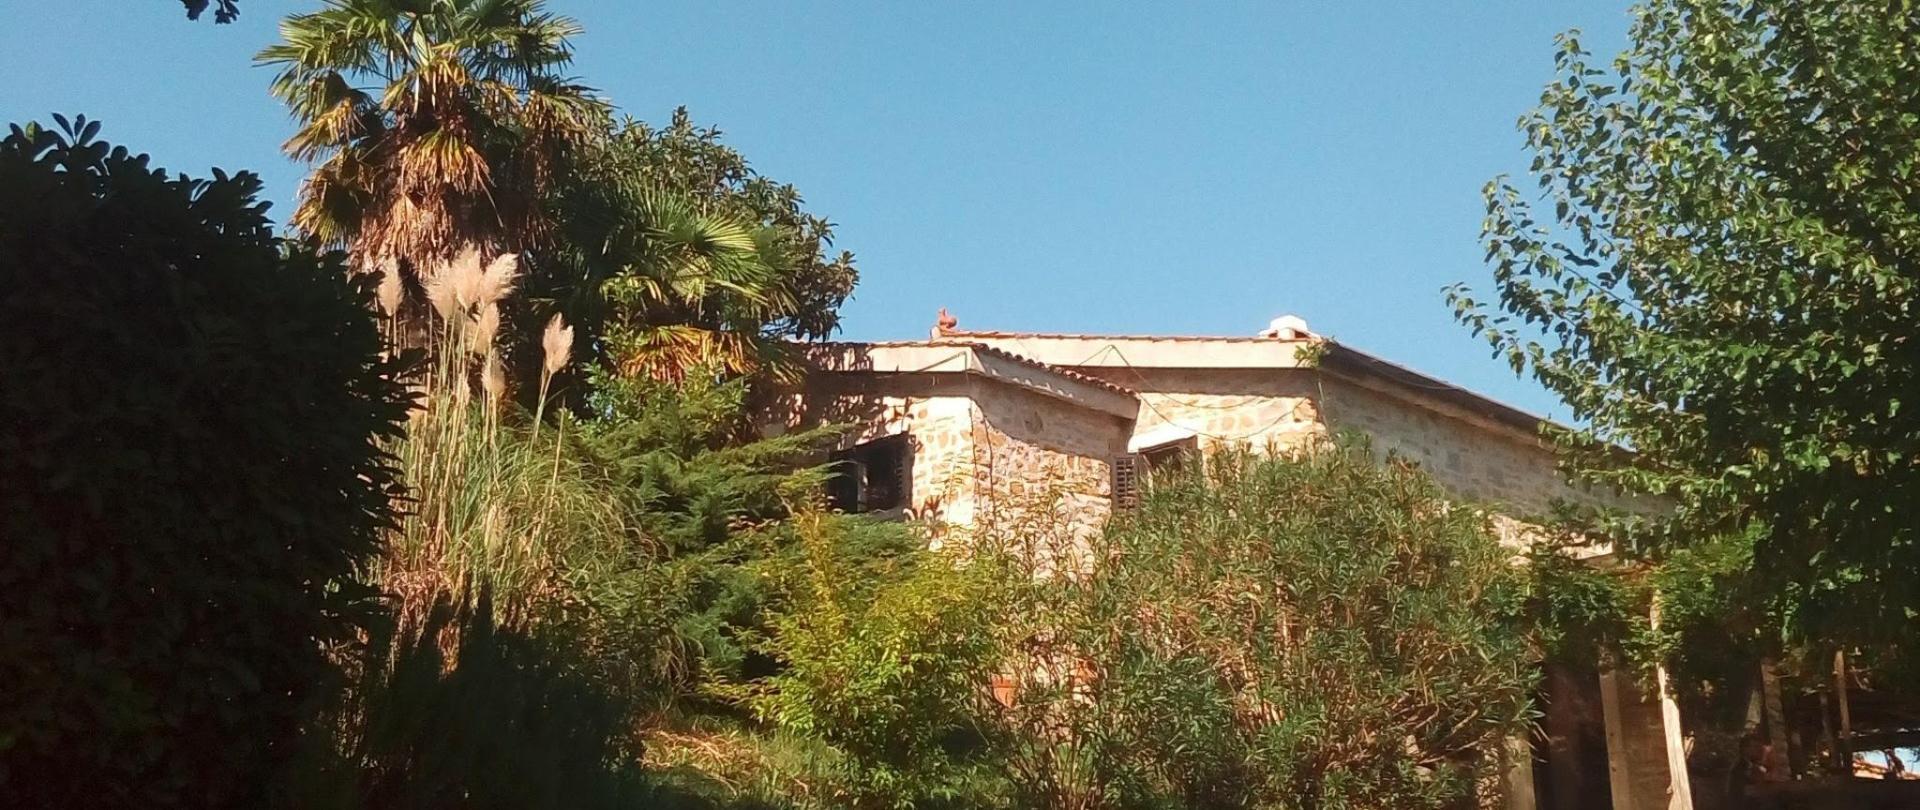 Stone Istrian Homestead.jpg